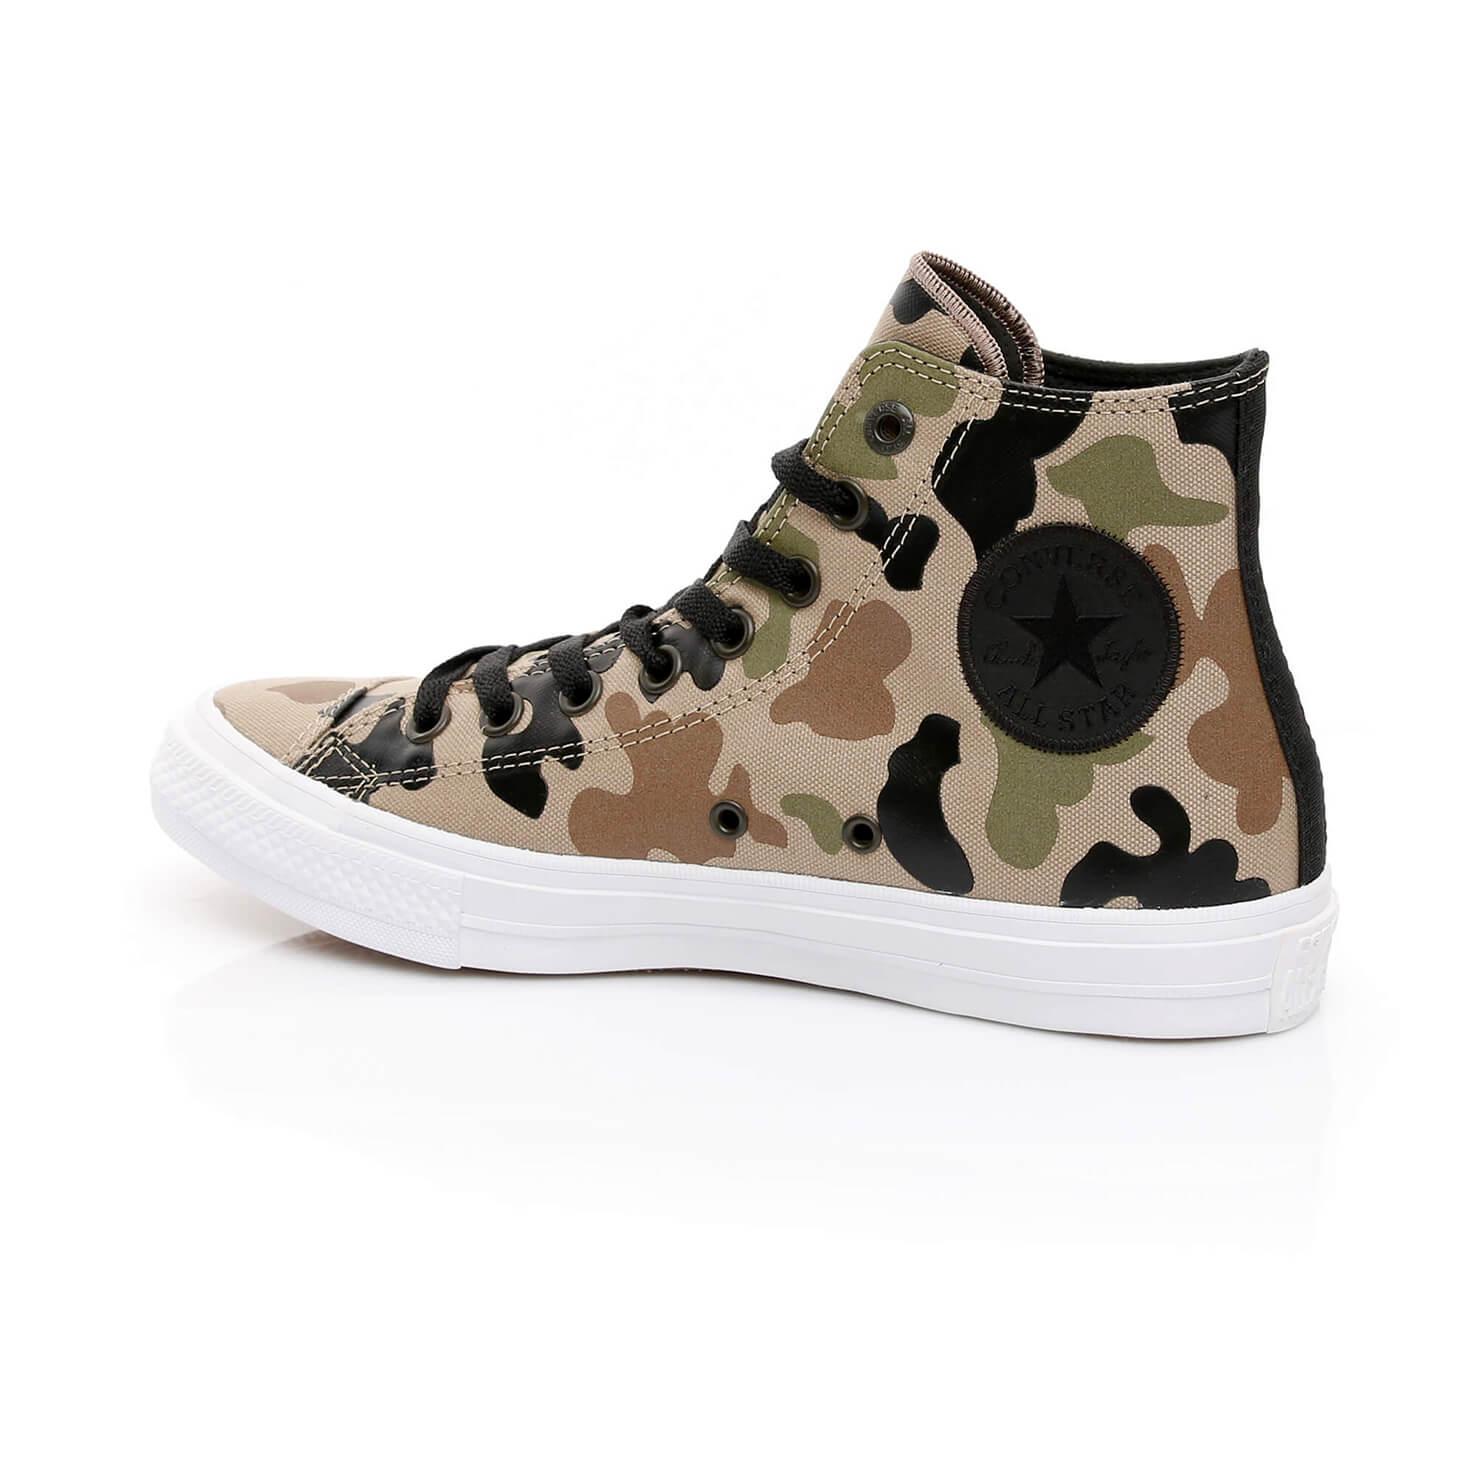 Converse Chuck Taylor All Star Erkek Kamuflaj Sneaker